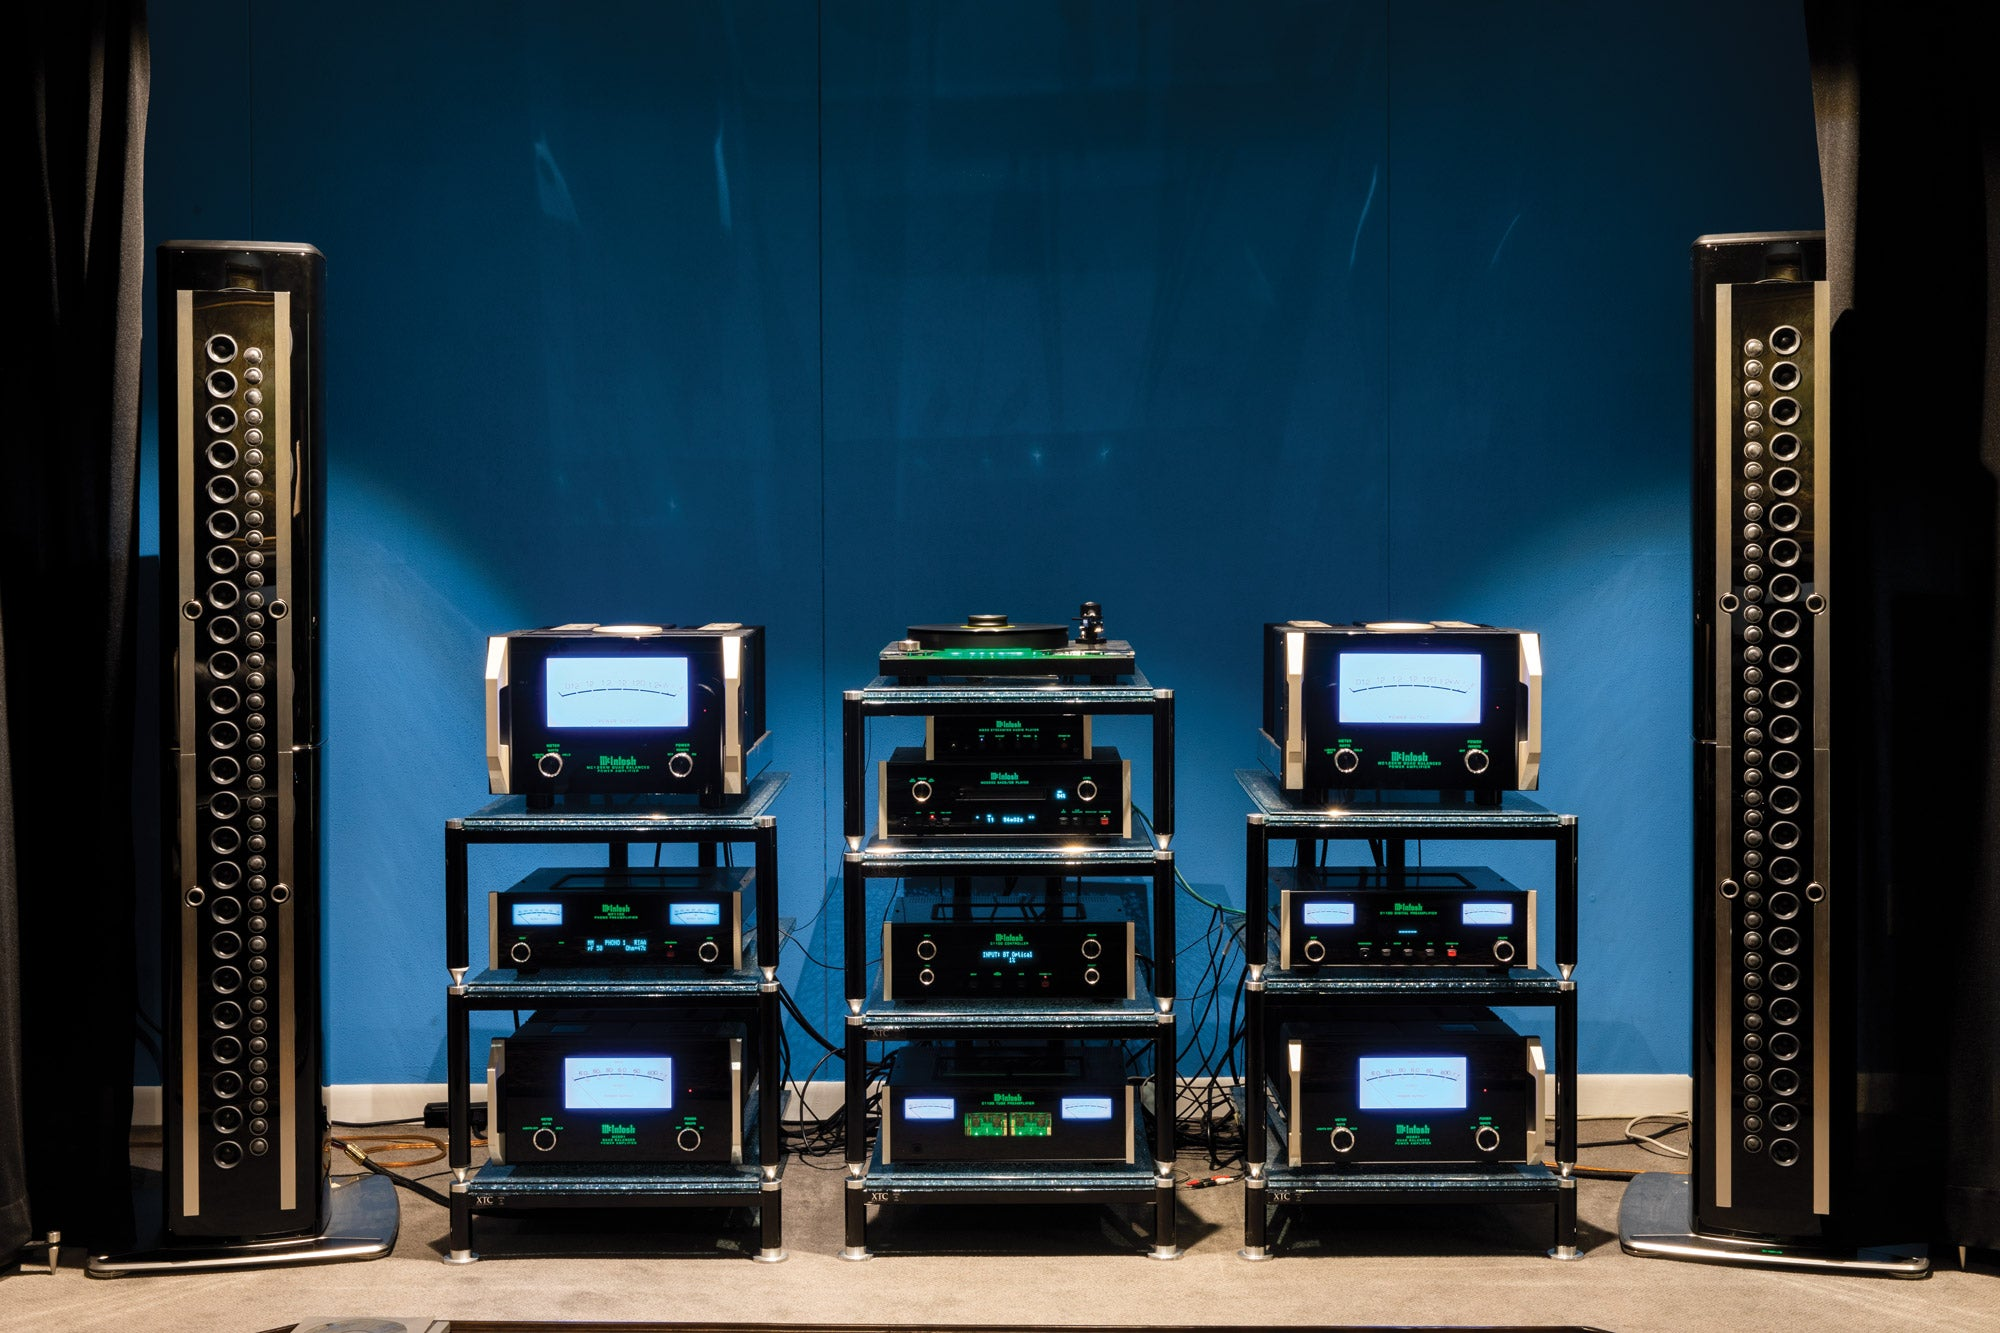 McIntosh sound equipment